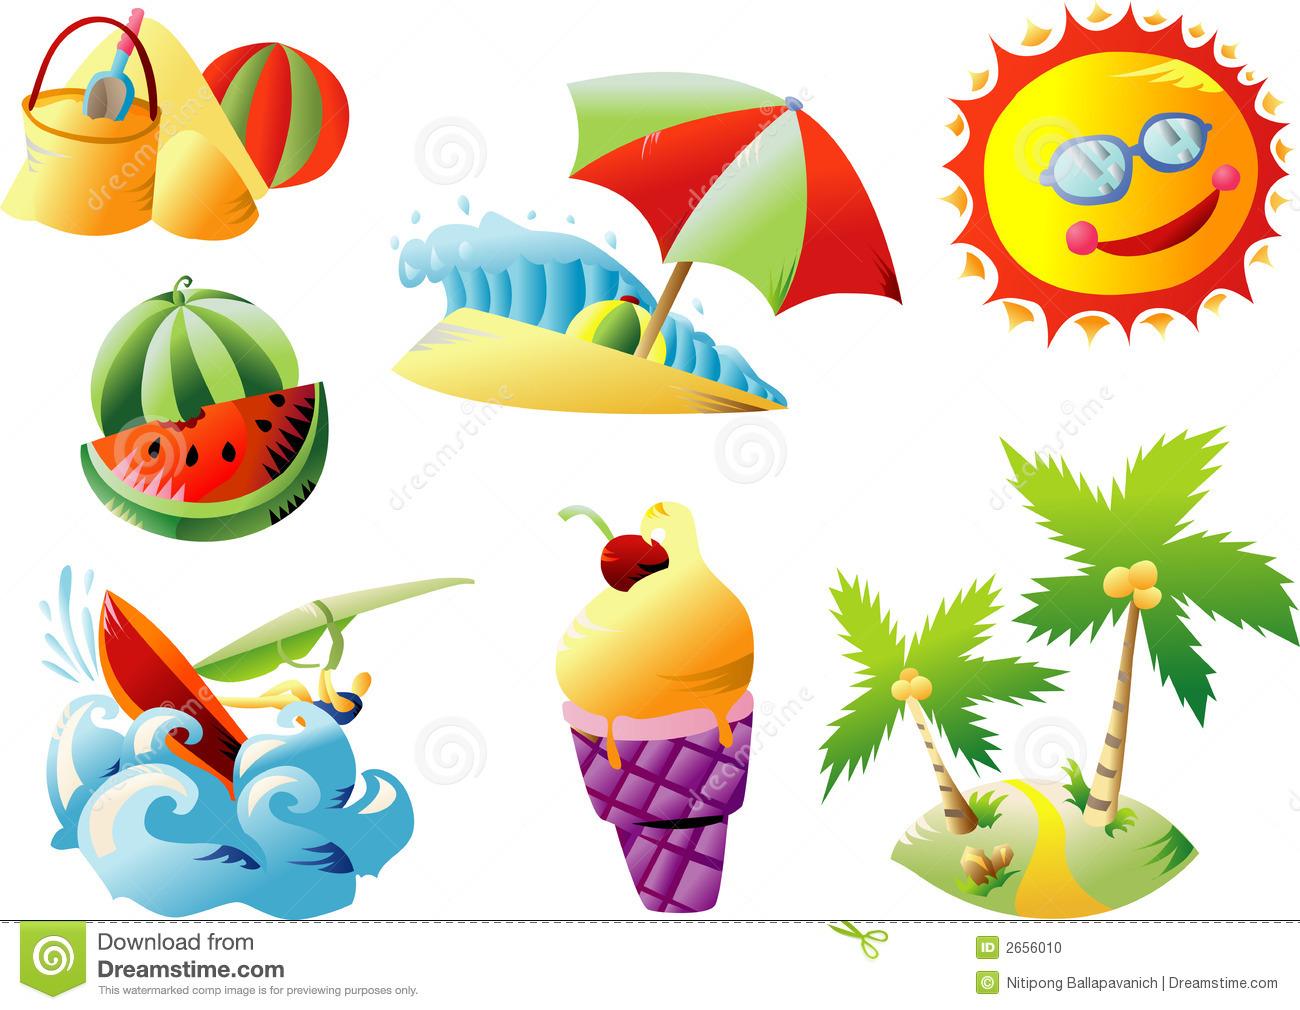 Fruit clipart summer season. Station